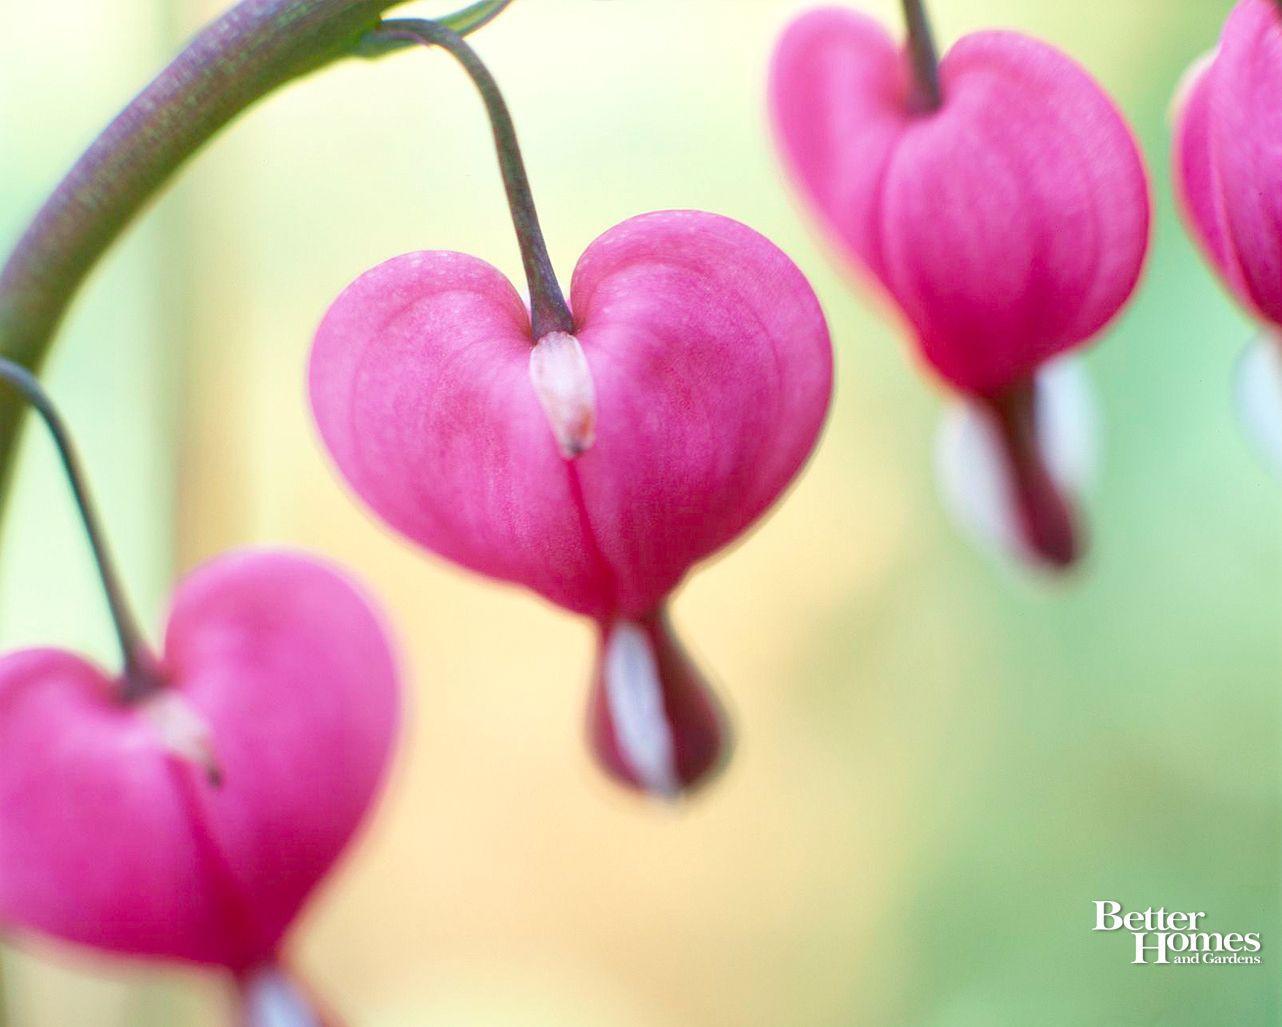 1282x1027 Flower Valentines Day Wallpaper For DesktopOffice Ink Blog